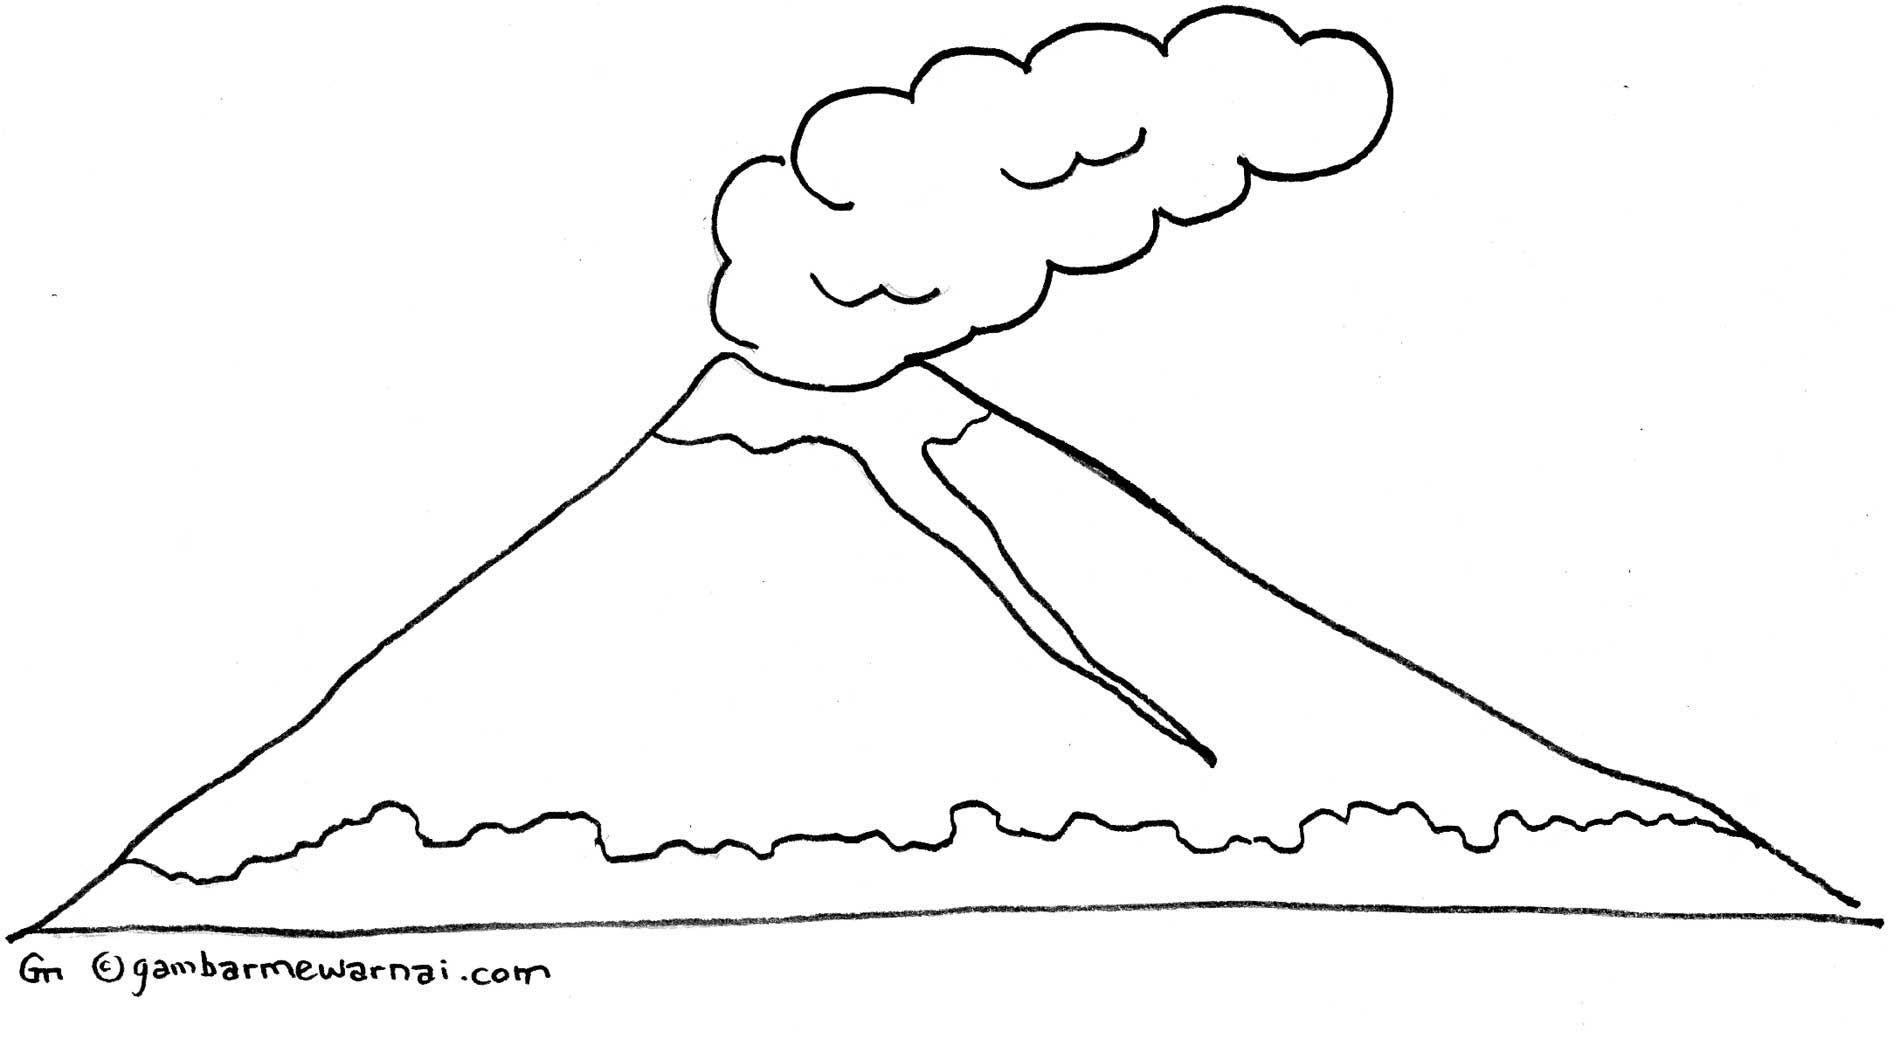 Gambar Mewarnai Gunung Thats Clever Pinterest